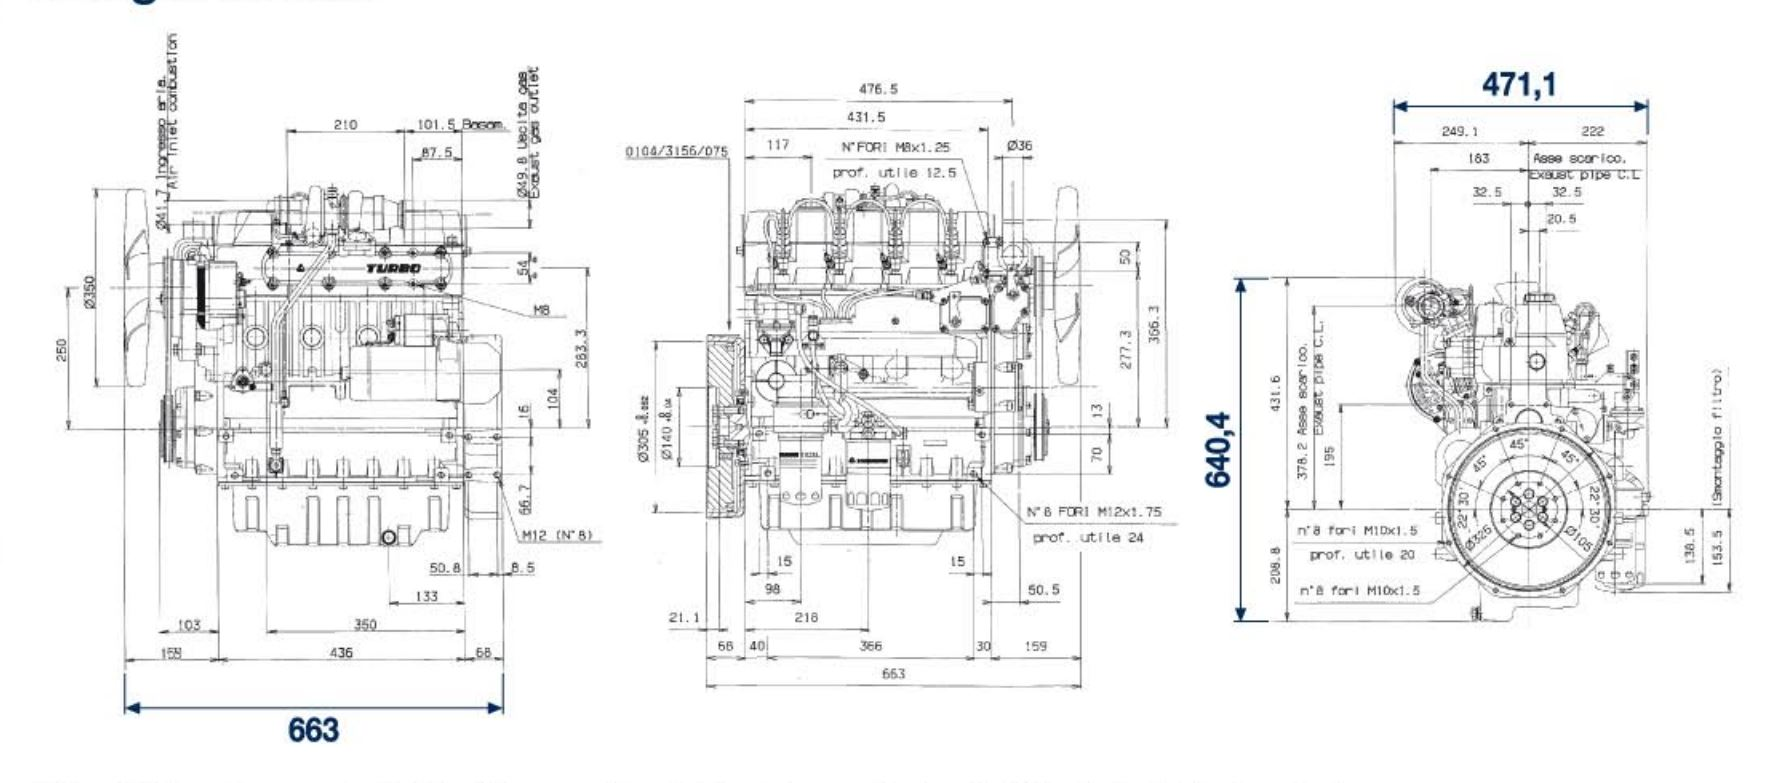 Lombardini Engine Ldw Turbo Chd